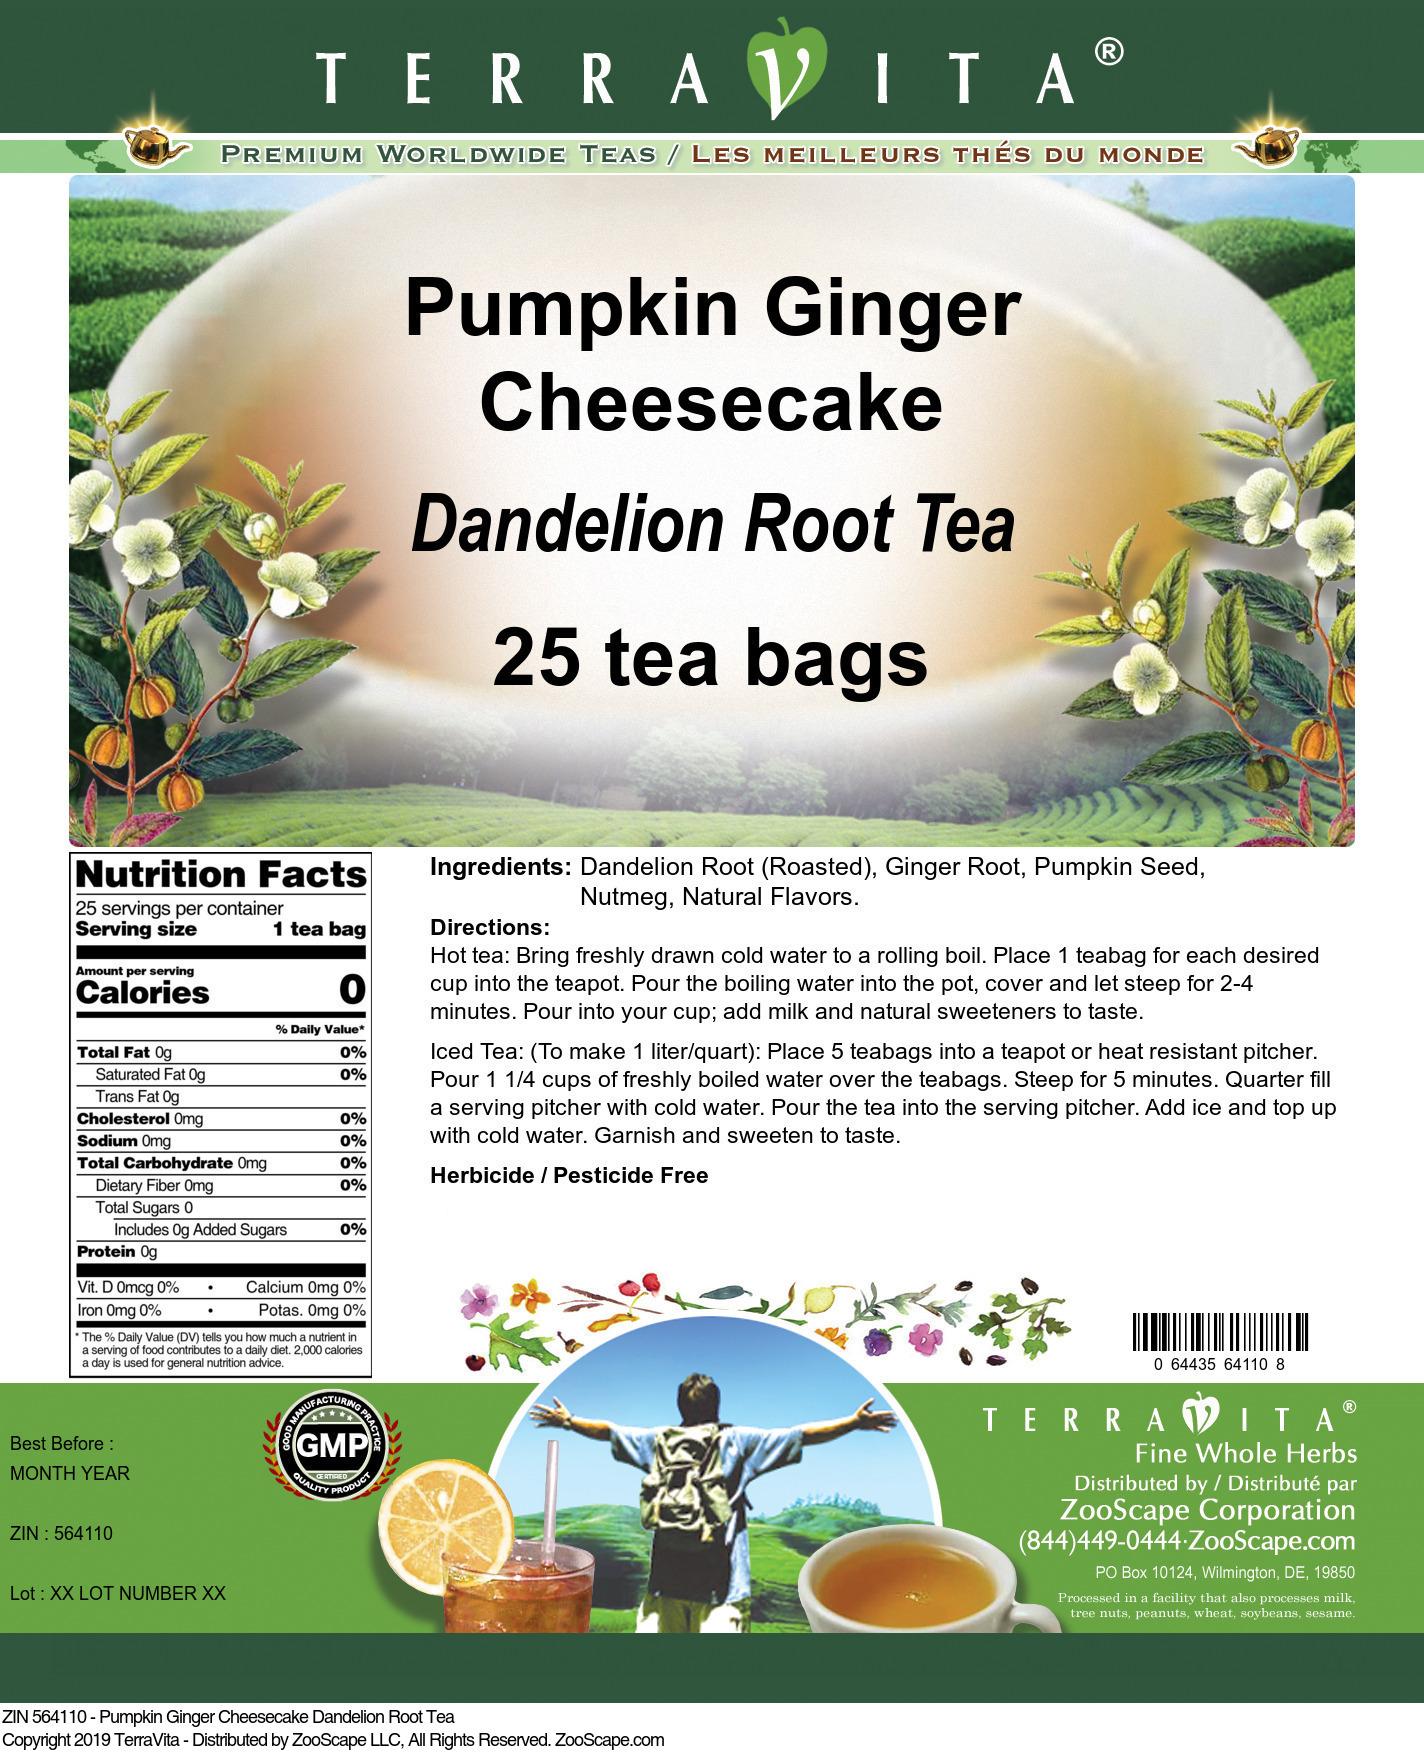 Pumpkin Ginger Cheesecake Dandelion Root Tea